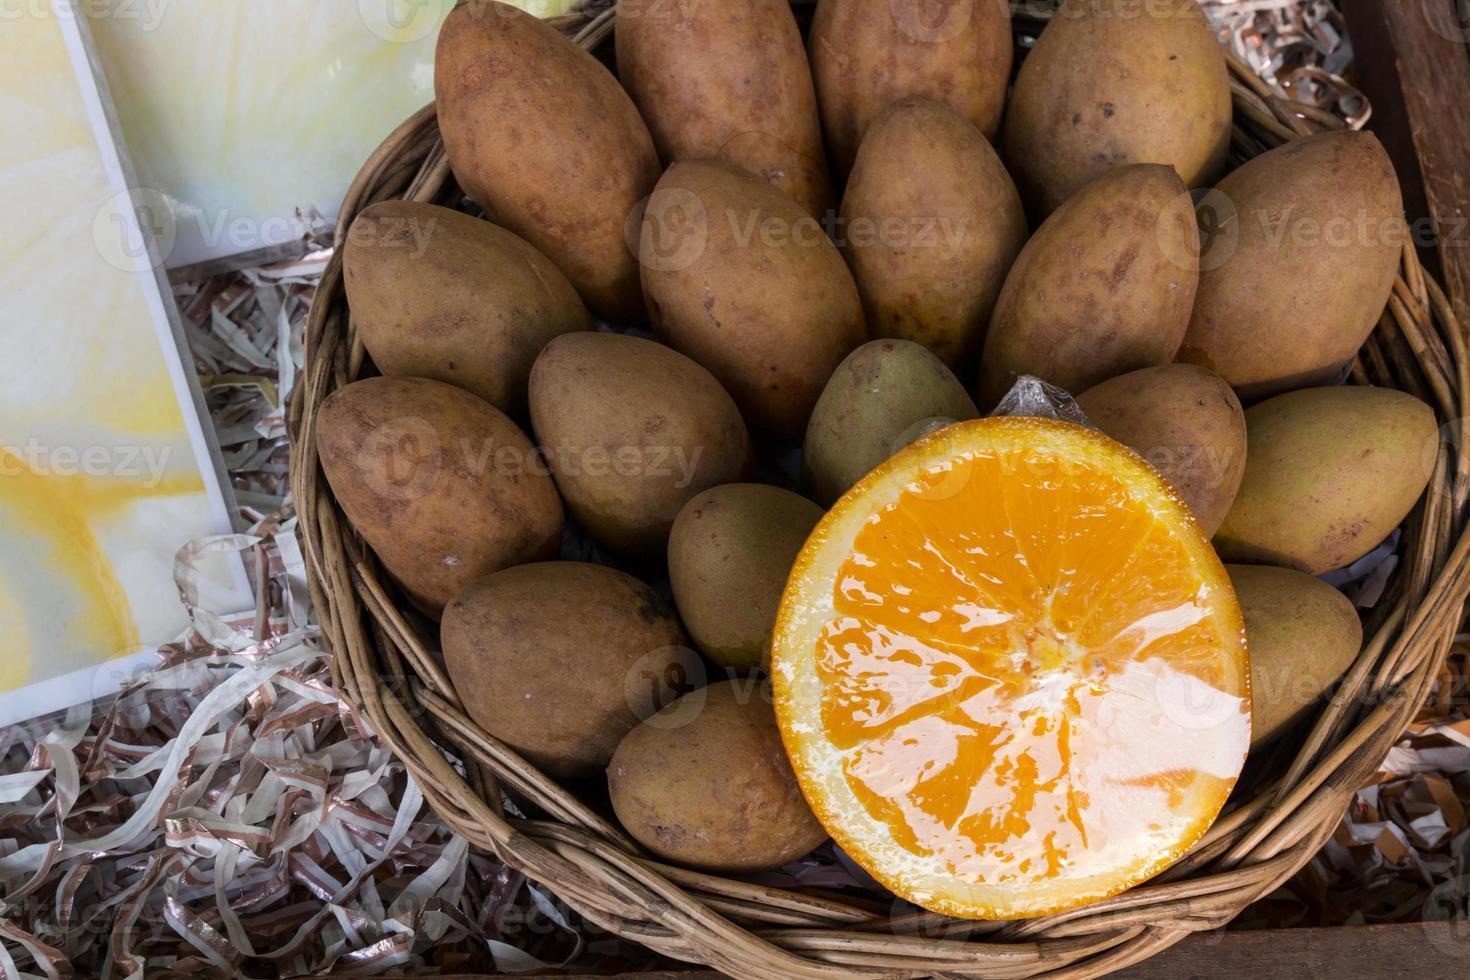 Sapodilla plums and orange in a basket photo